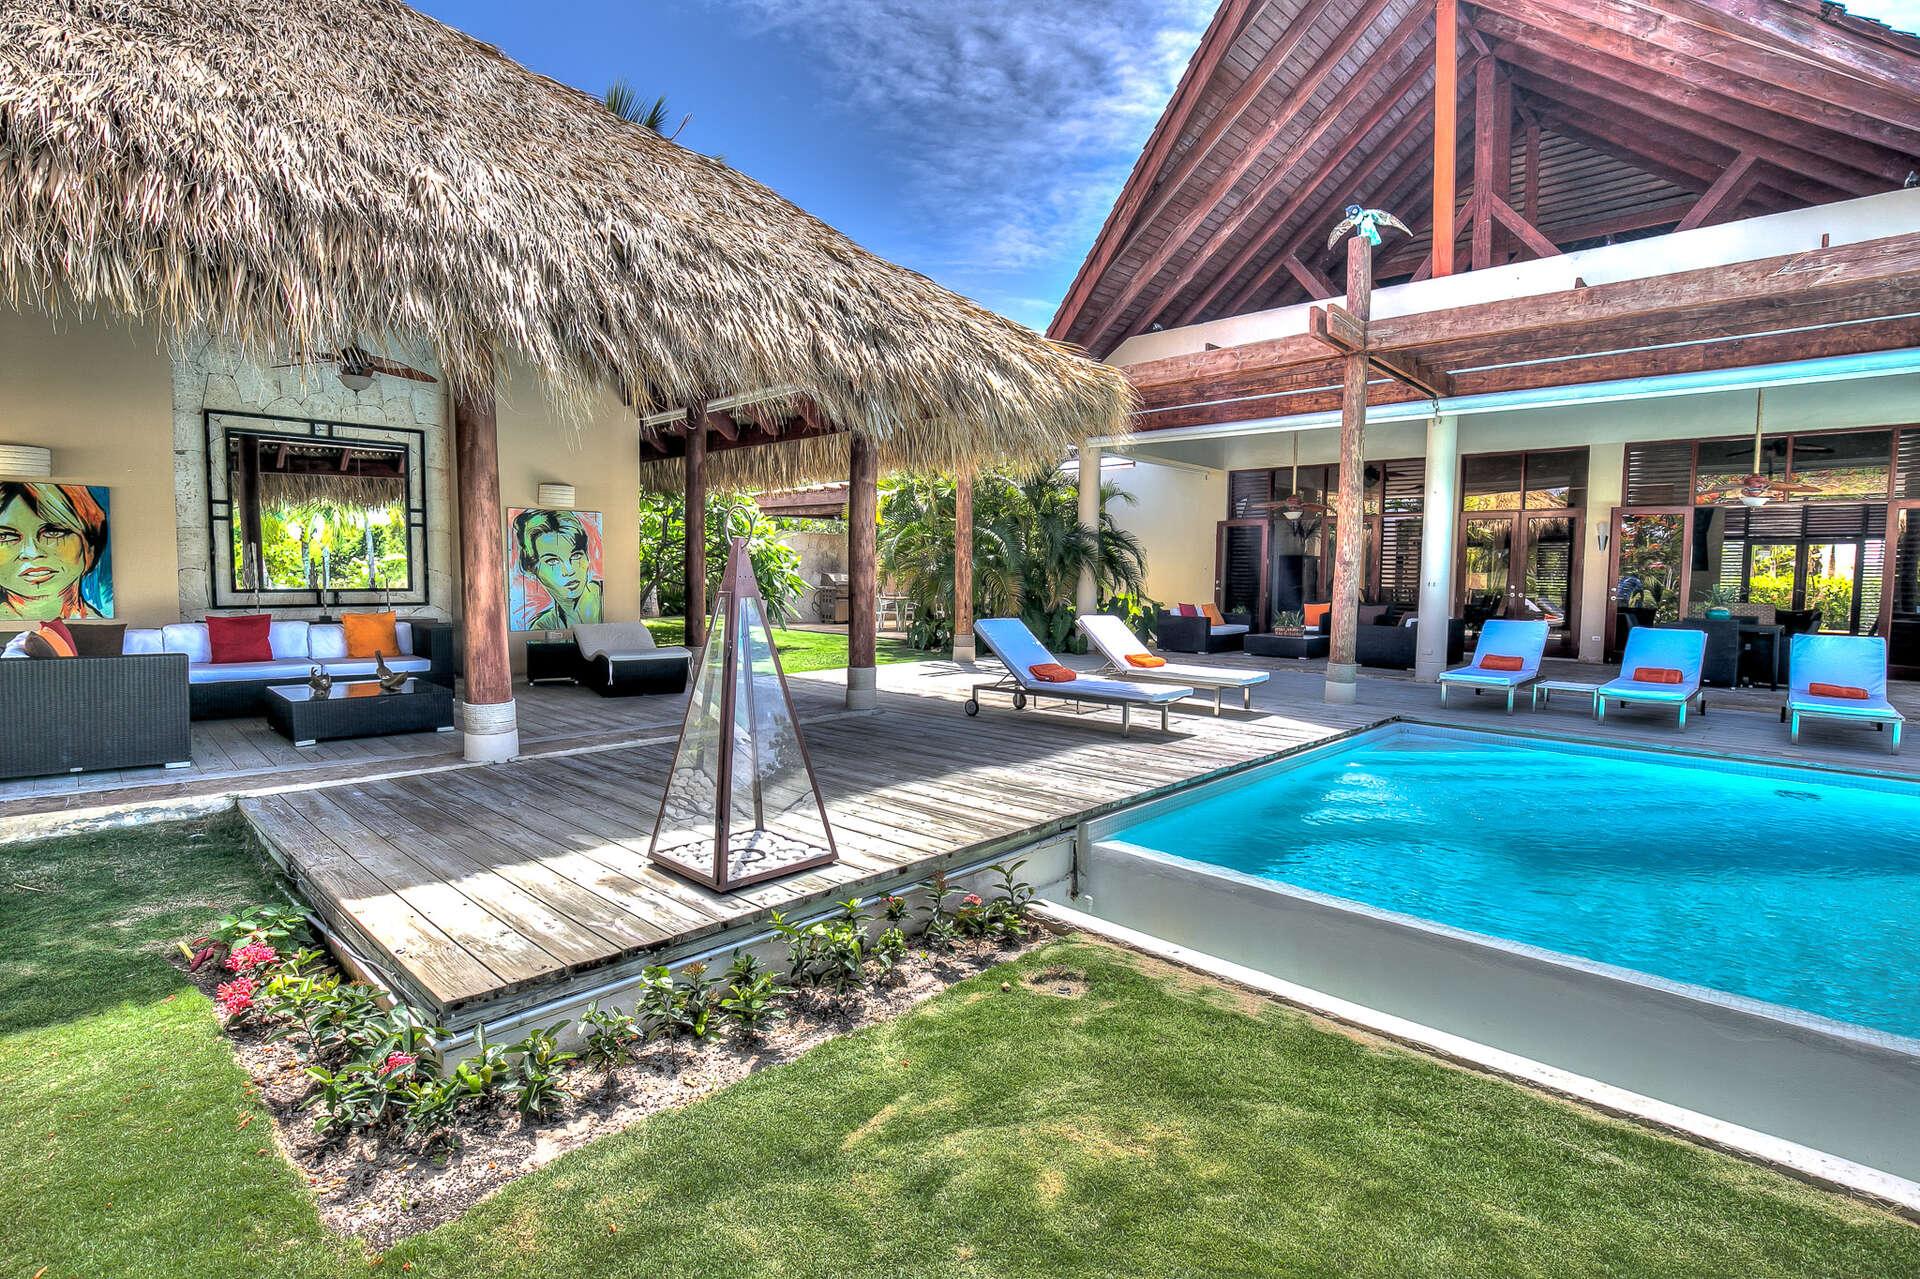 Luxury villa rentals caribbean - Dominican republic - Punta cana - Punta cana resort and club - La Cana H3 | Caballet - Image 1/33